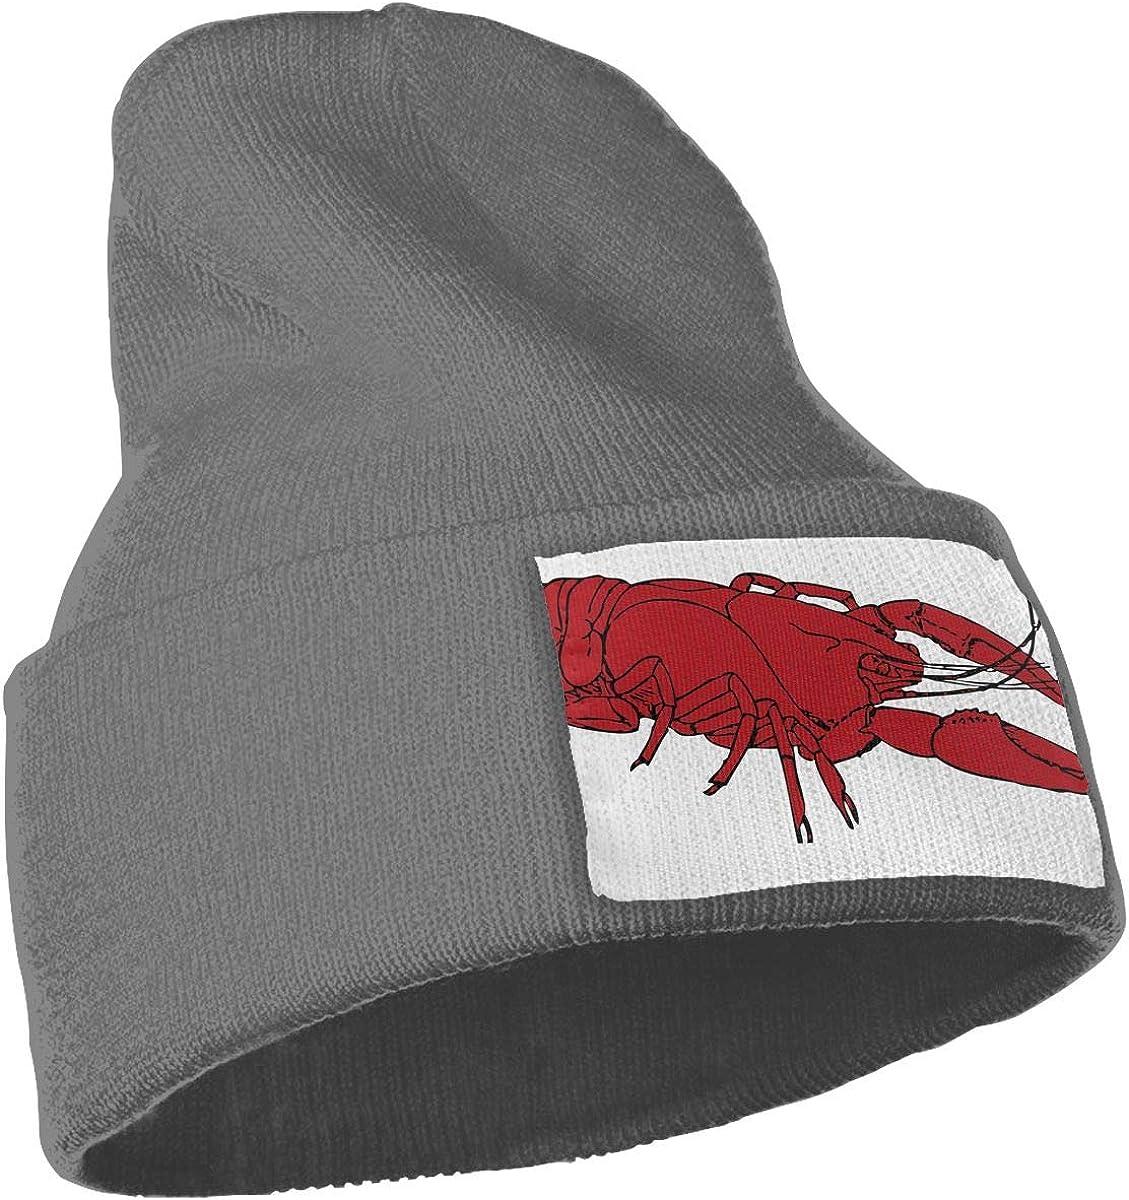 QZqDQ Crawfish Beer Unisex Fashion Knitted Hat Luxury Hip-Hop Cap